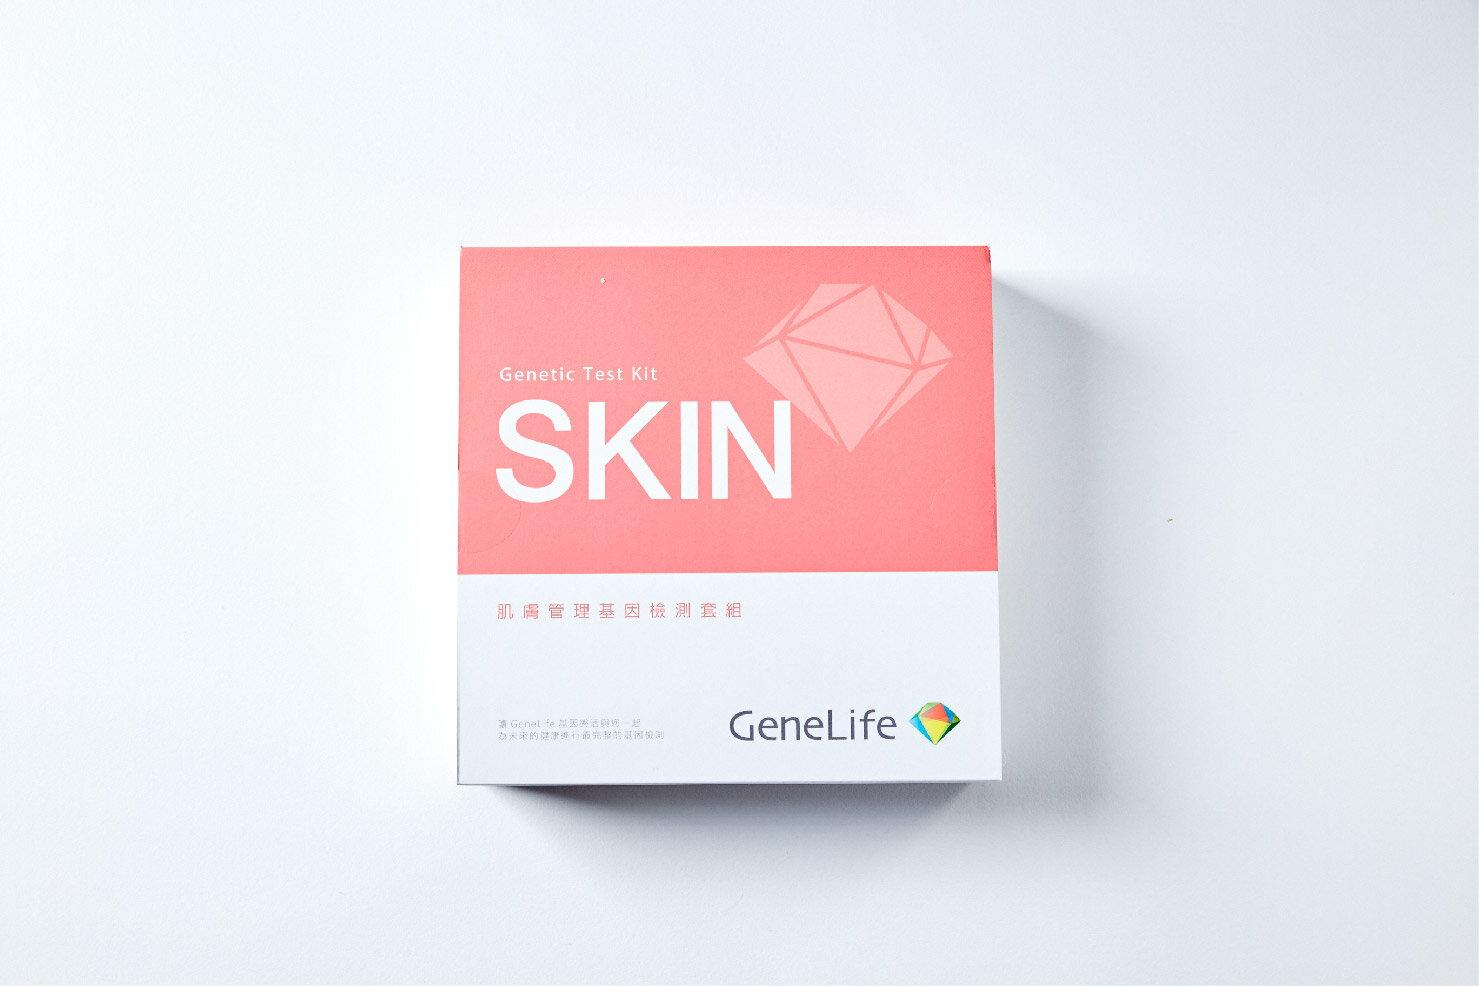 GeneLife SKIN 肌膚管理基因檢測(檢測肌膚最原始的膚況,才能選擇最適合自己的保養品) 4